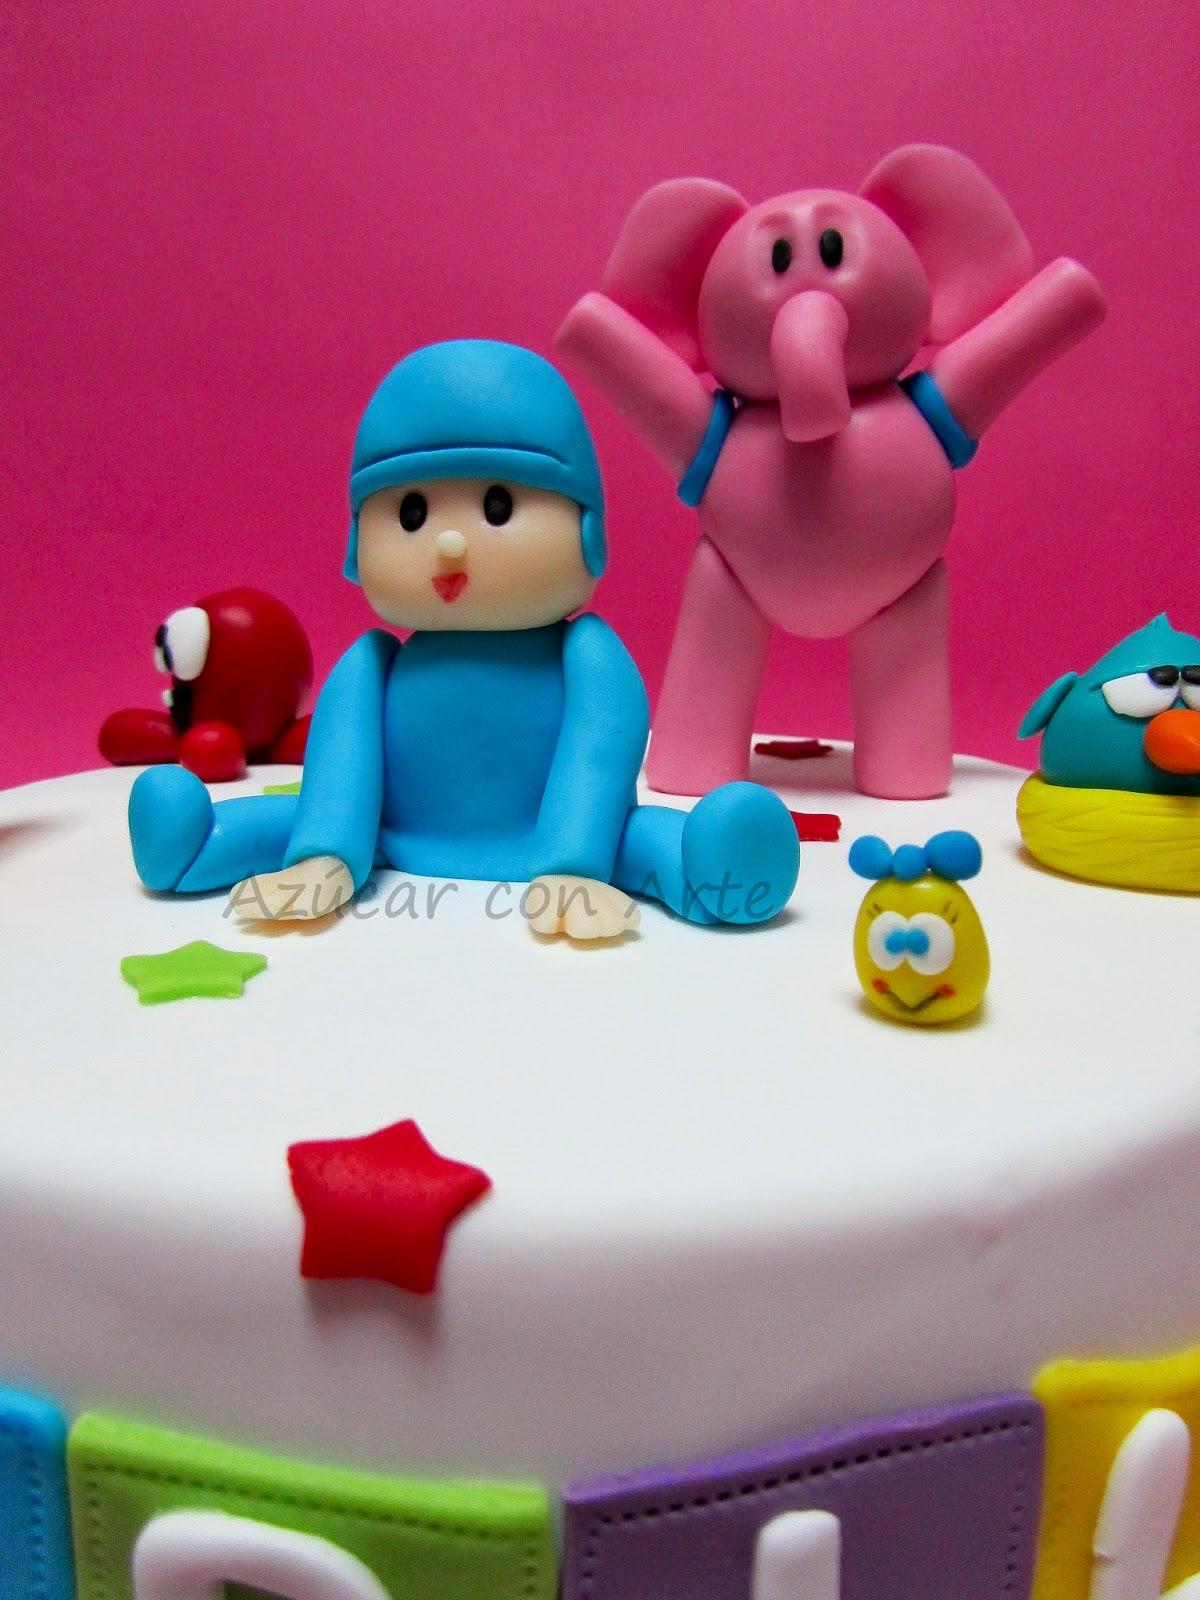 Pocoyo, pocoyo cake, gluten free cake |azucar con arte